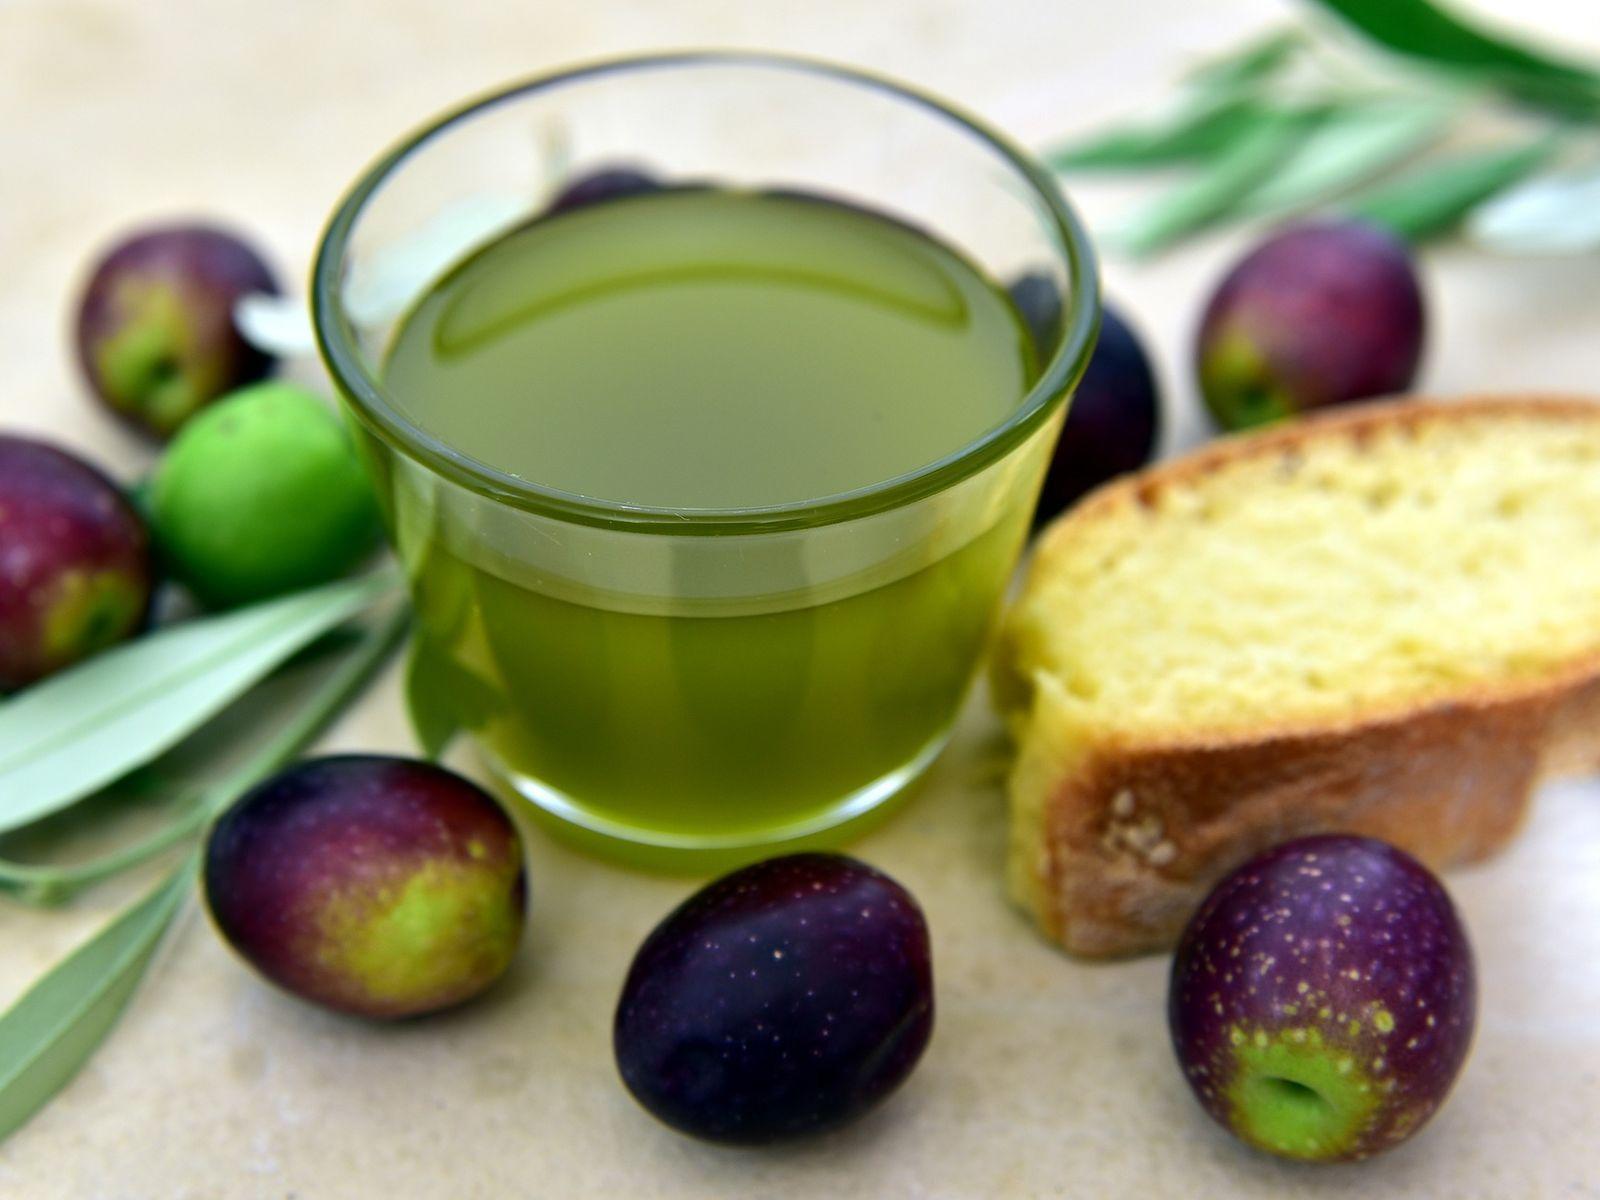 Spanish olive oil tasting cup